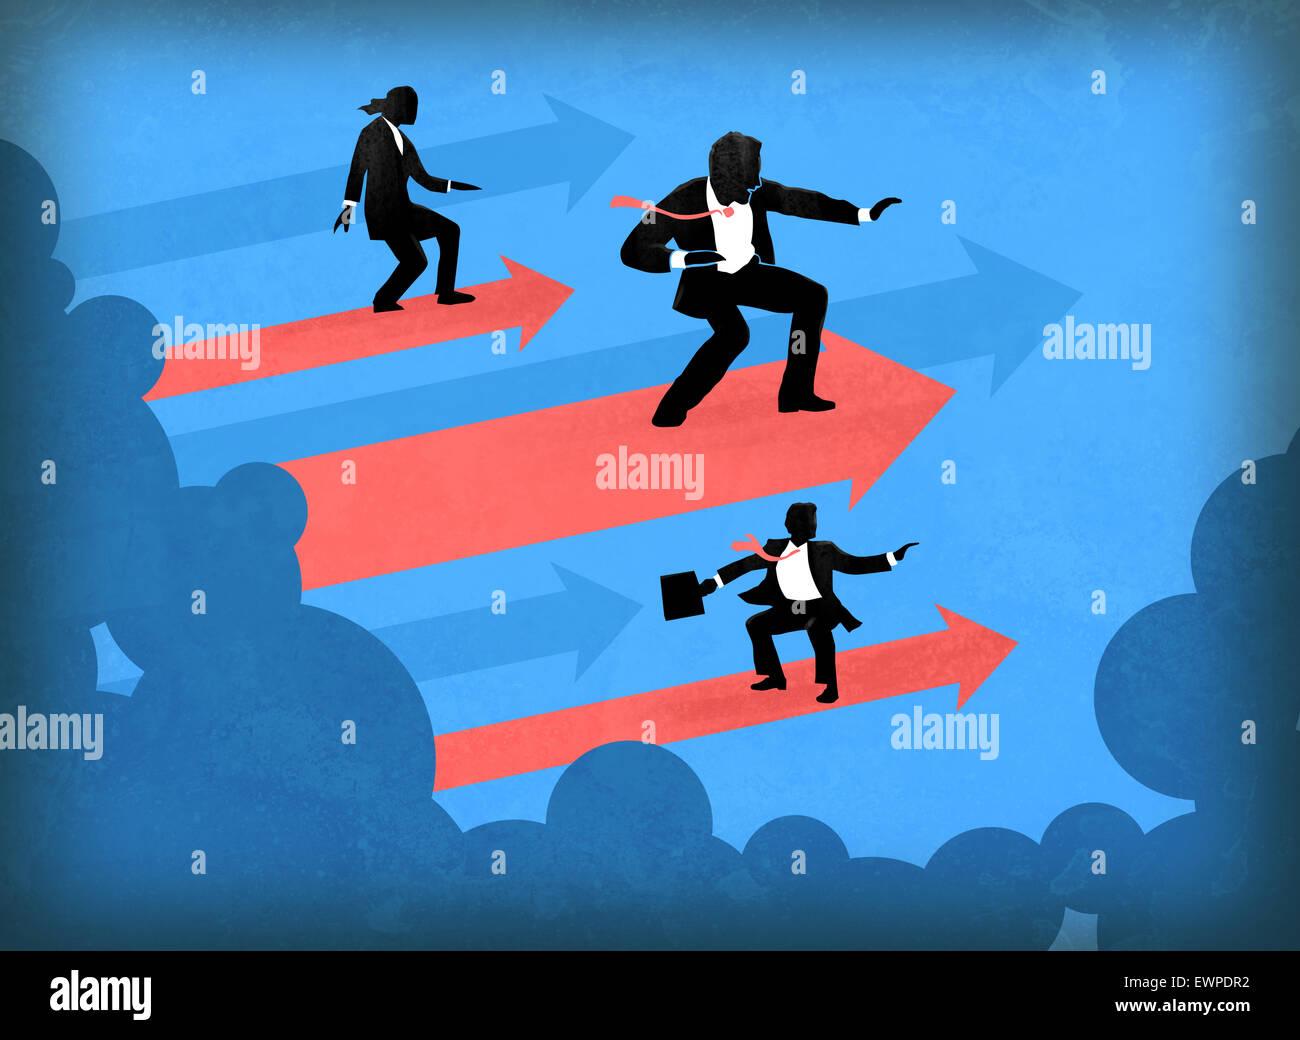 Business-Leute surfen auf Pfeile in Richtung Erfolg Stockbild